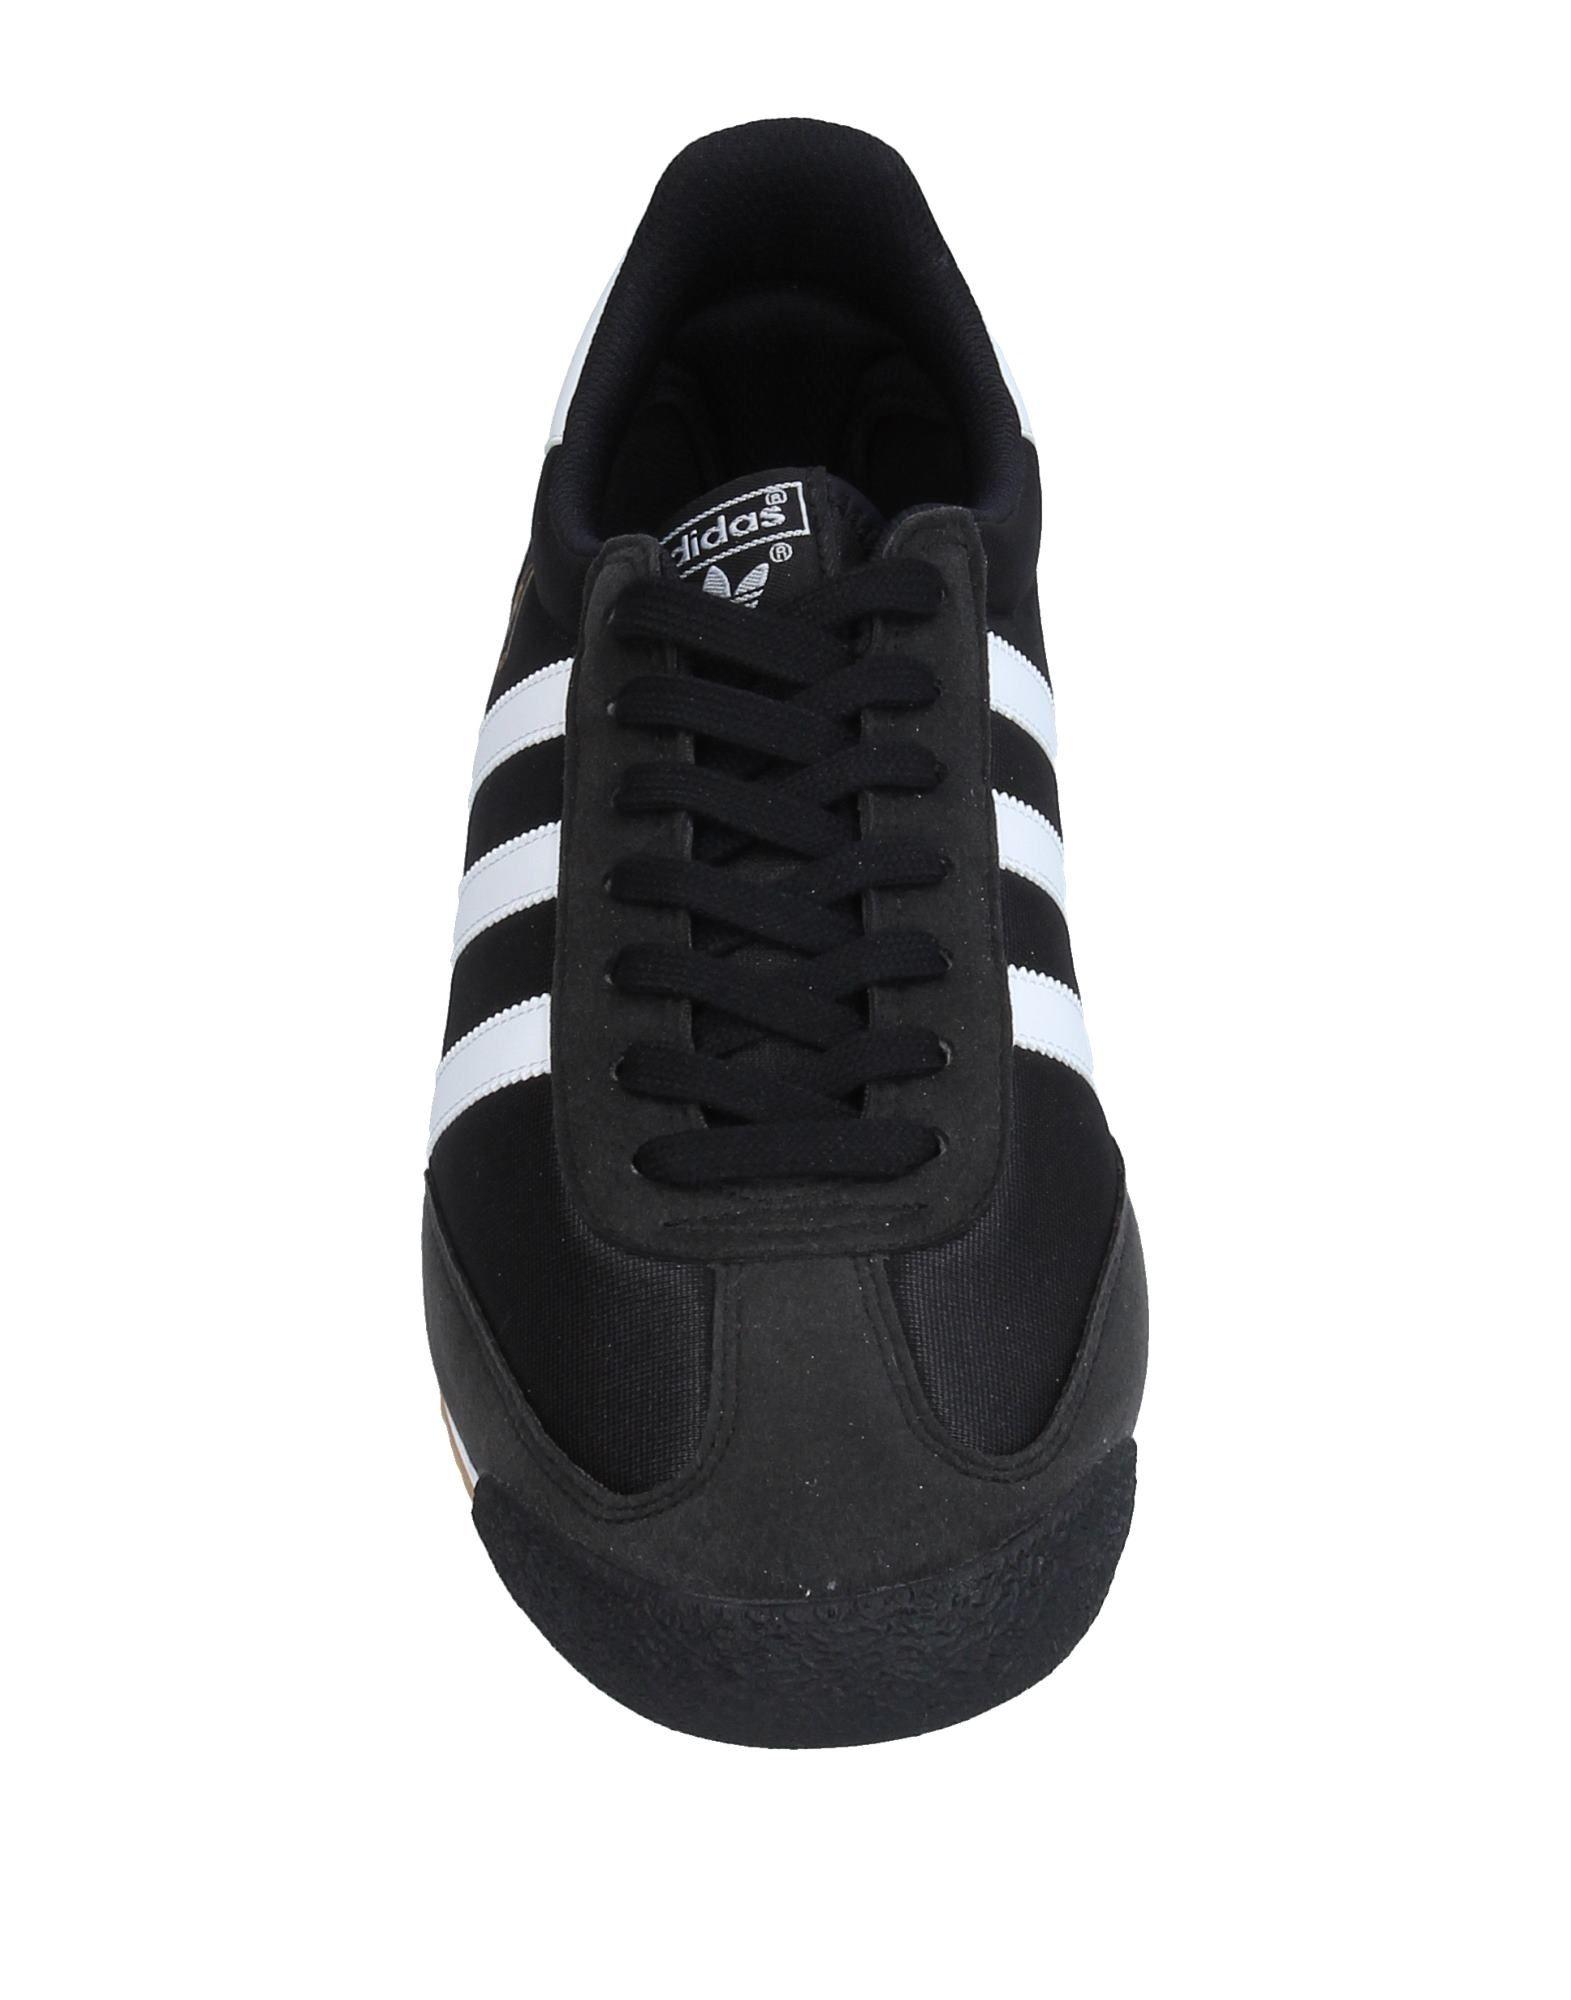 adidas originaux baskets - hommes adidas des originaux des adidas baskets en ligne le royaume - uni - 11335411np 980783